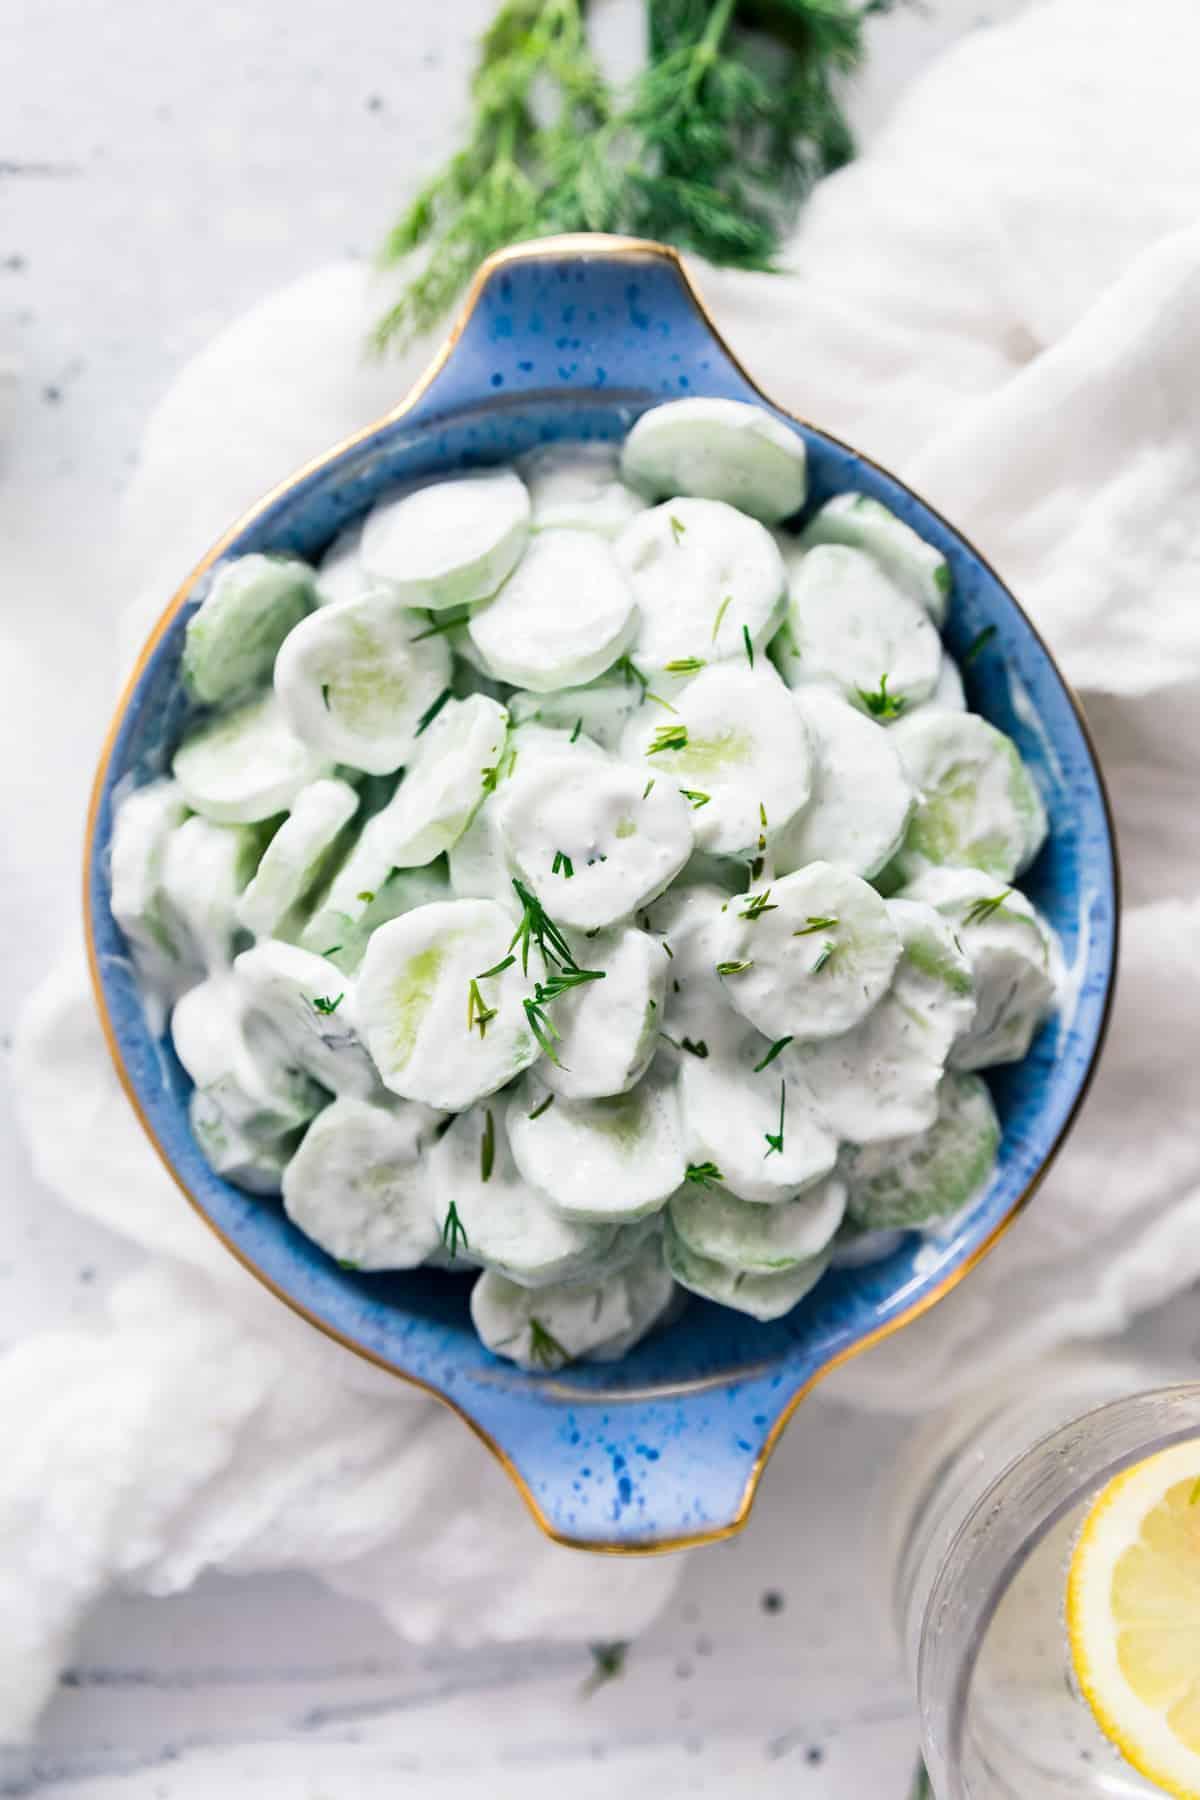 Bowl of cucumber salad